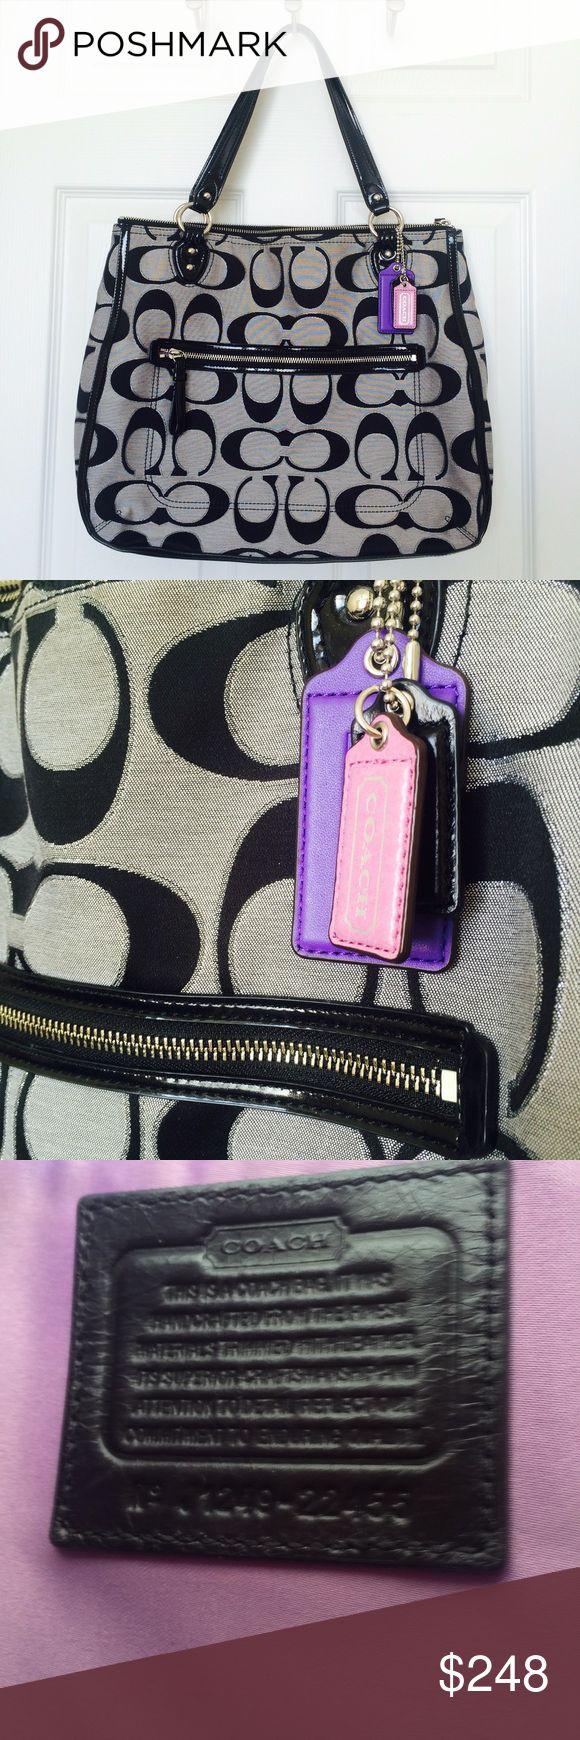 dfed9100ec4b Best i love coach images on pinterest coach handbags coach jpg 580x1740  Purple leopard coach weekender